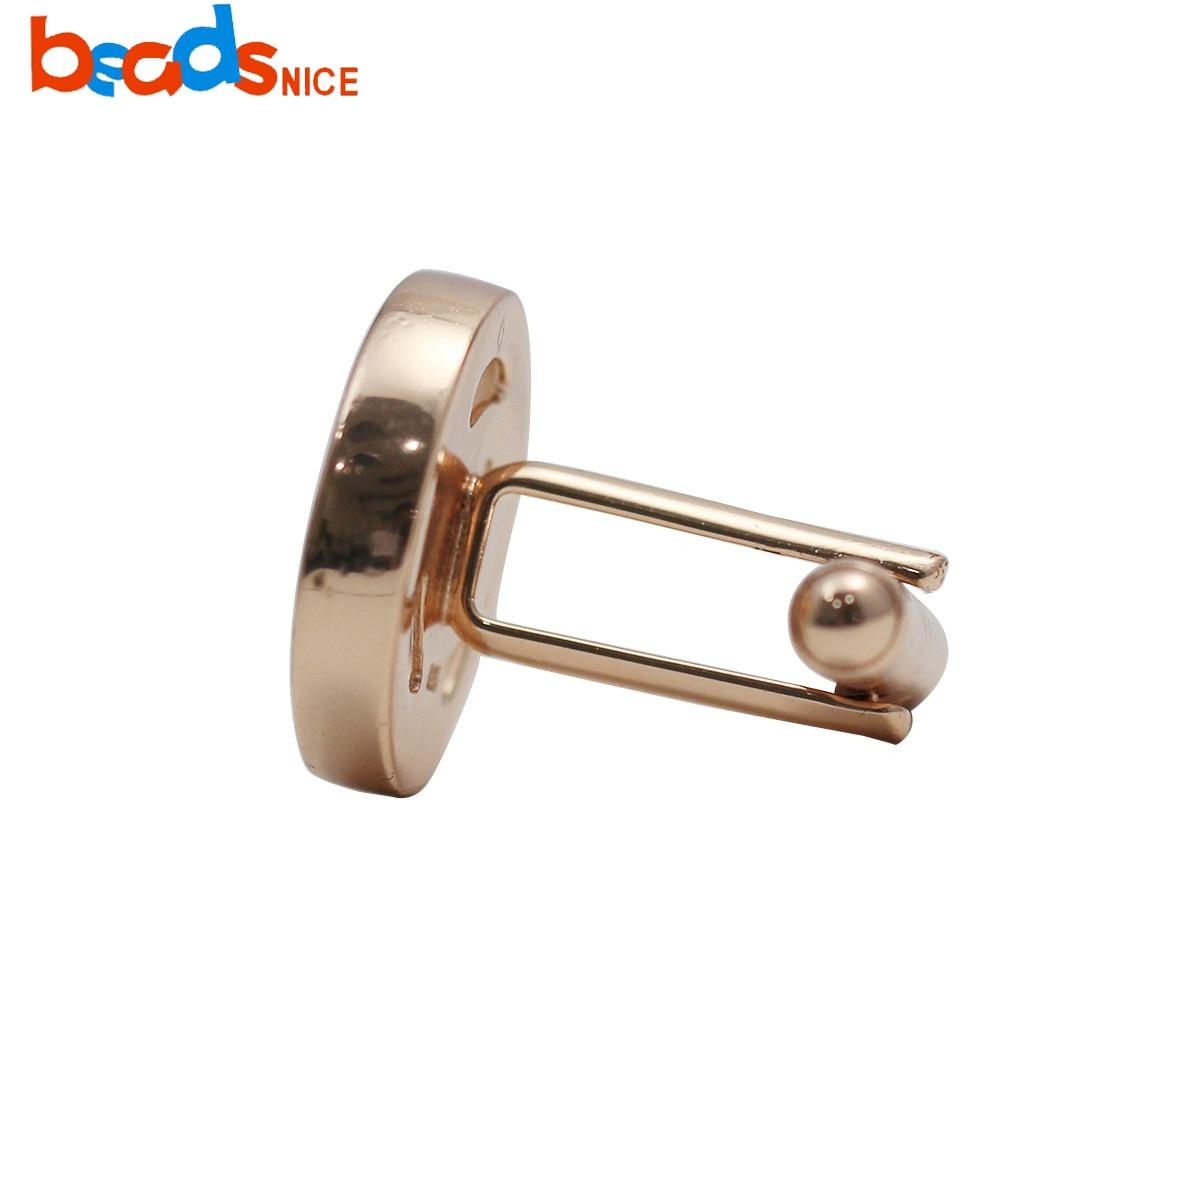 Beadsnice  925 sterling silver cufflinks base for men's jewelry making ID 38062